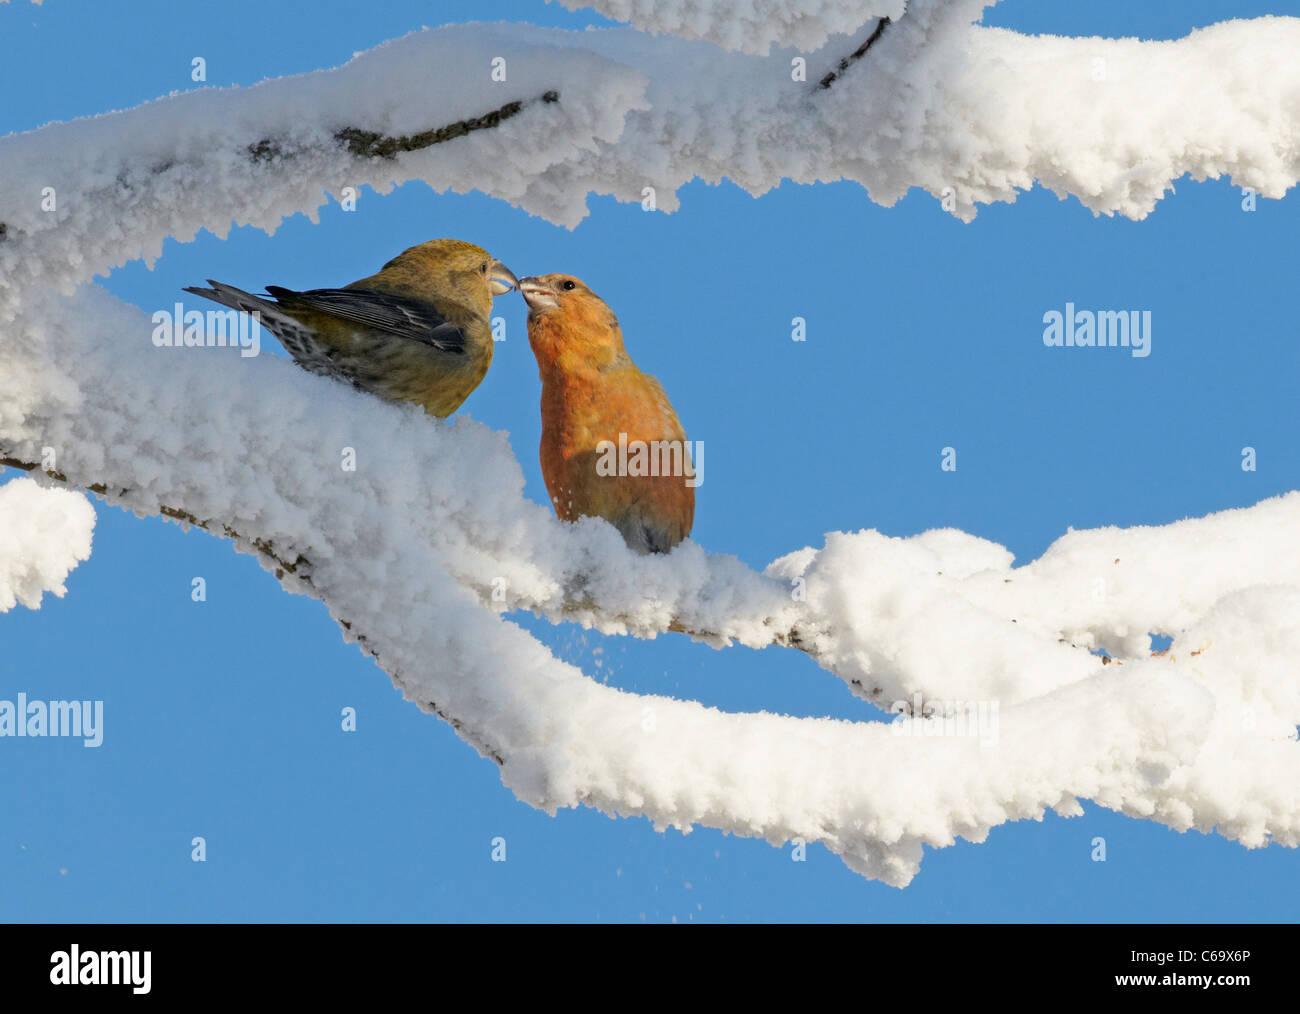 Común, Rojo Crossbill Crossbill (Loxia curvirostra). Tierna pareja encaramado sobre una ramita nevados. Imagen De Stock